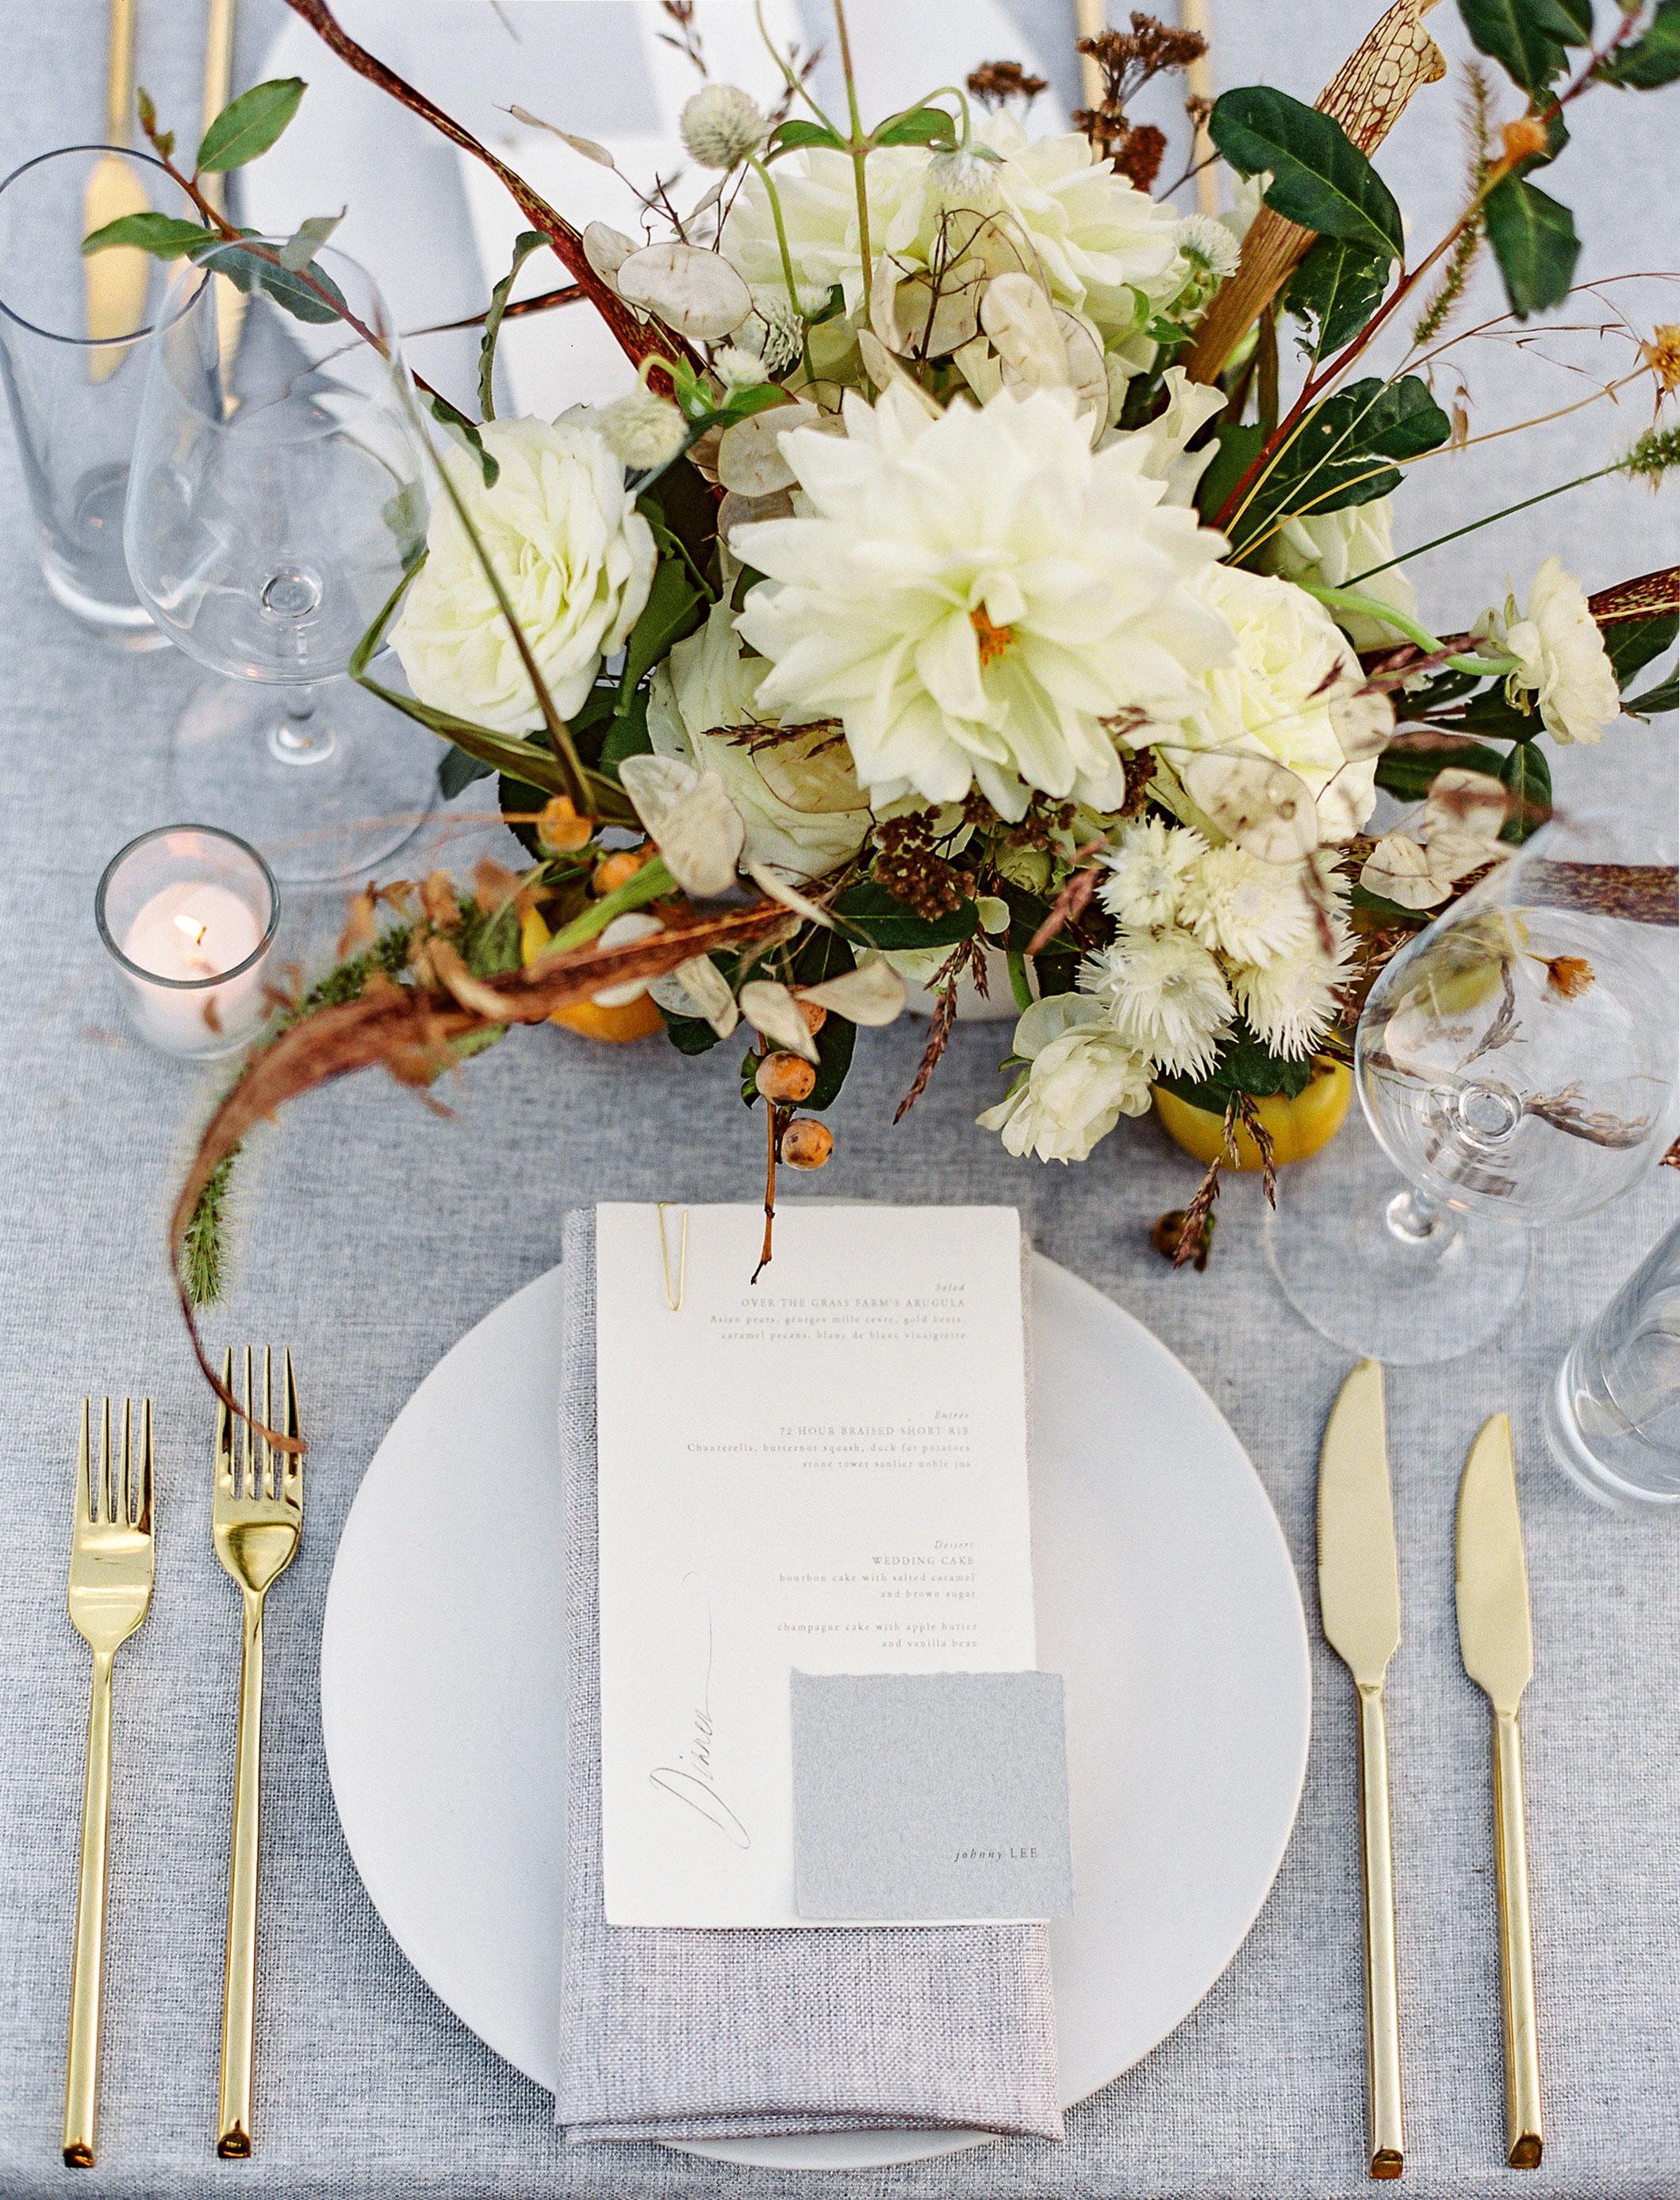 linda robert wedding place setting